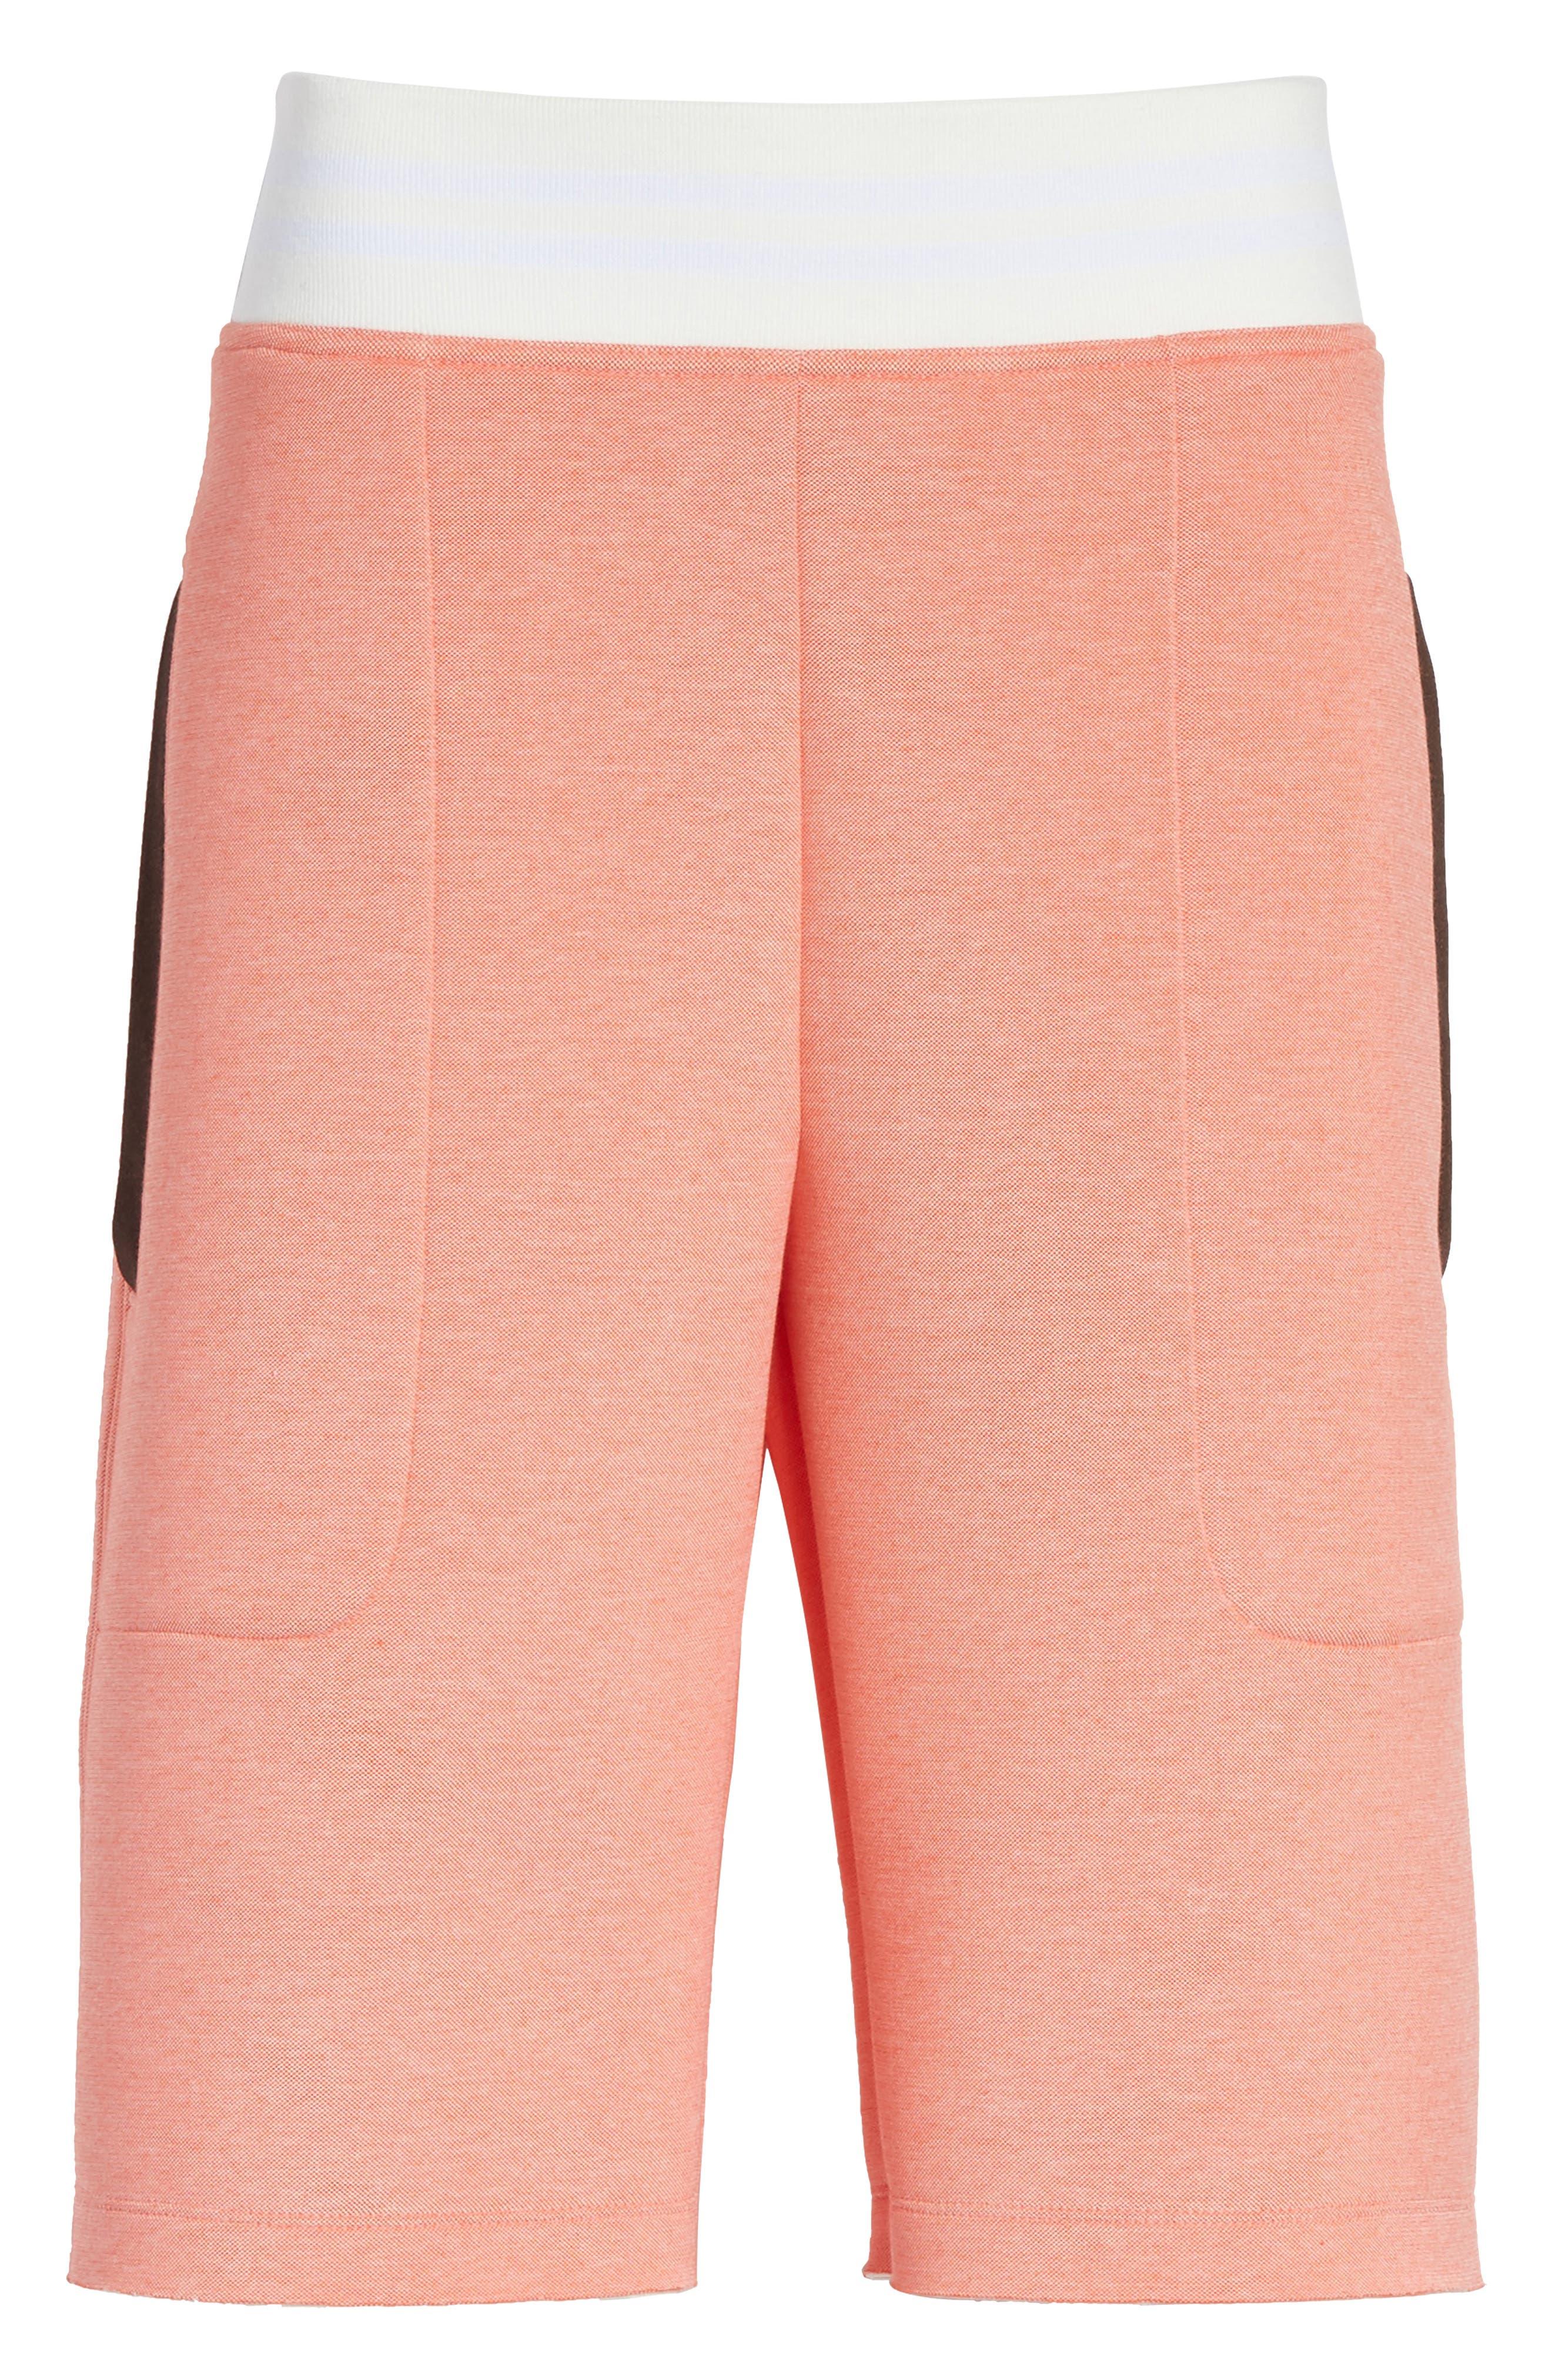 Tech Shorts,                             Alternate thumbnail 7, color,                             Coral